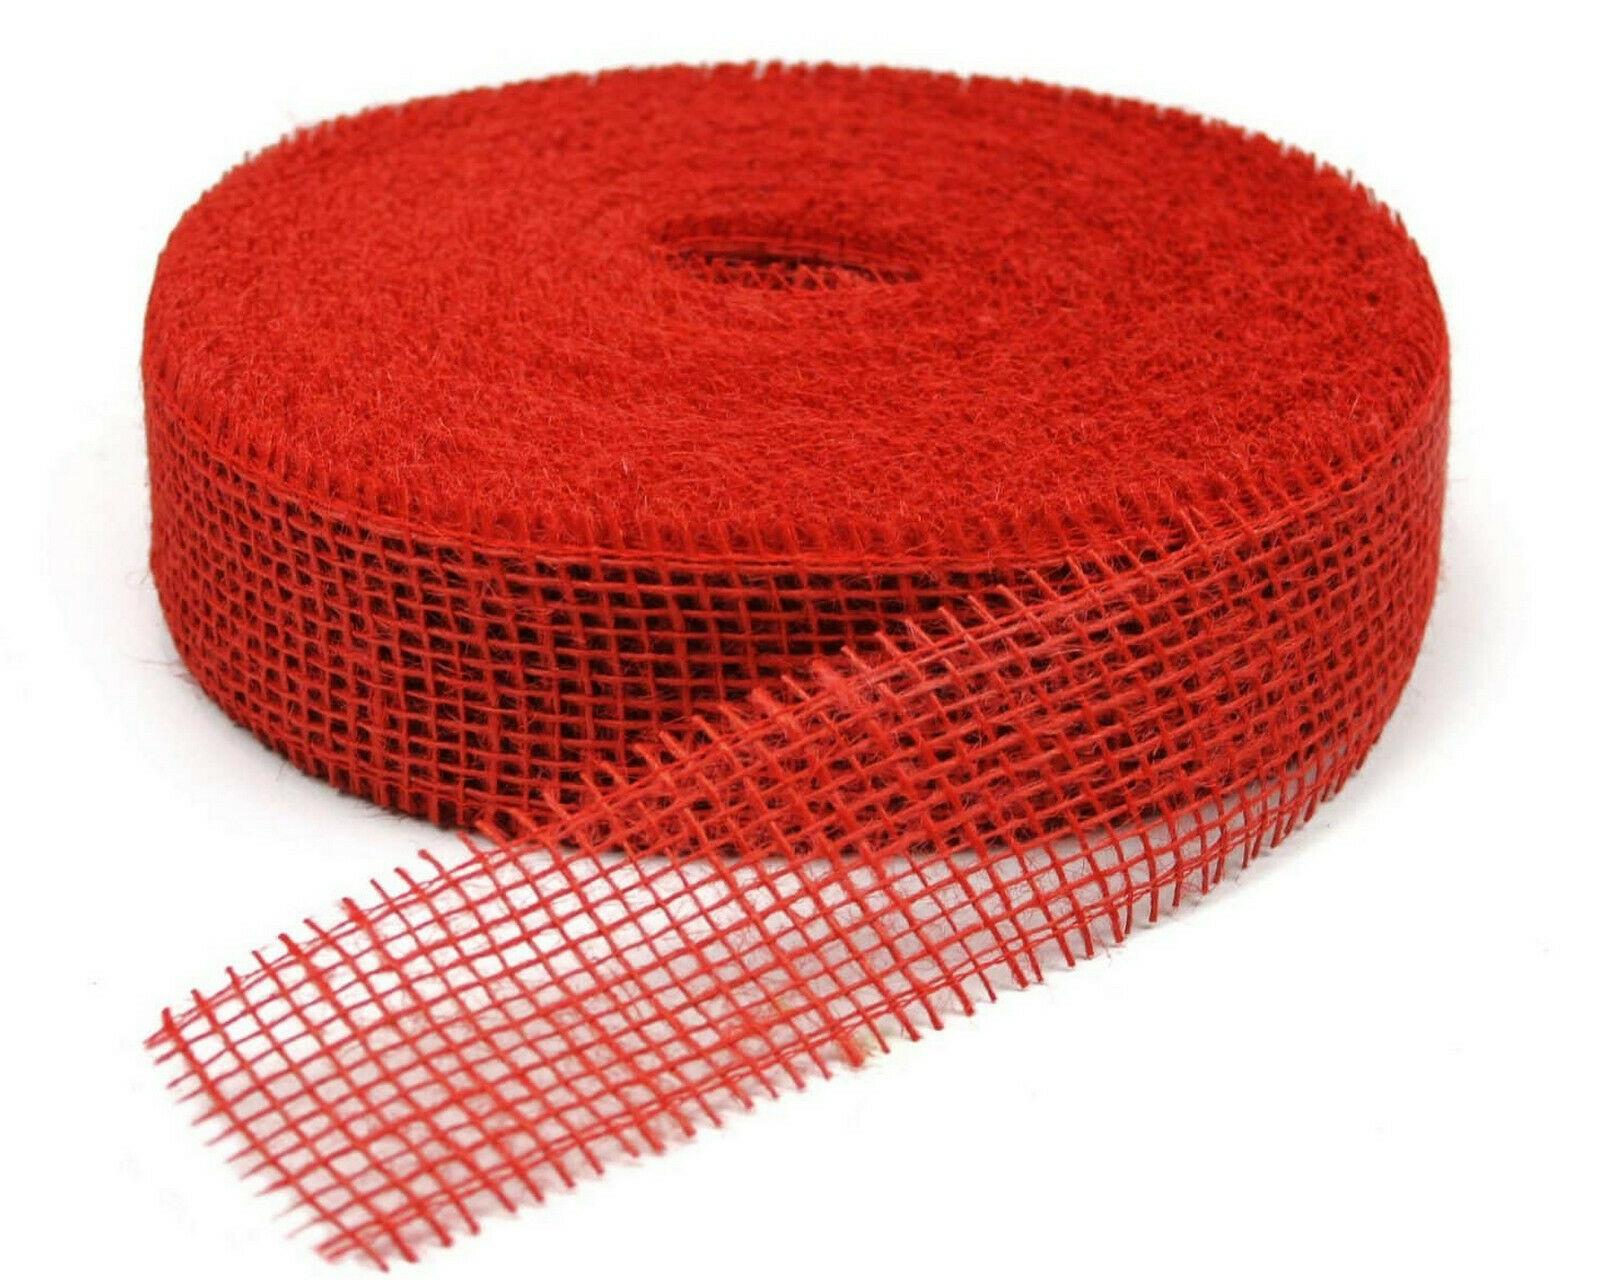 Juteband 40 m x 5 cm Dekoband ab 0,20 €/m Jute Rolle Schleifenband Rupfen Band - rot (hart) 40 m